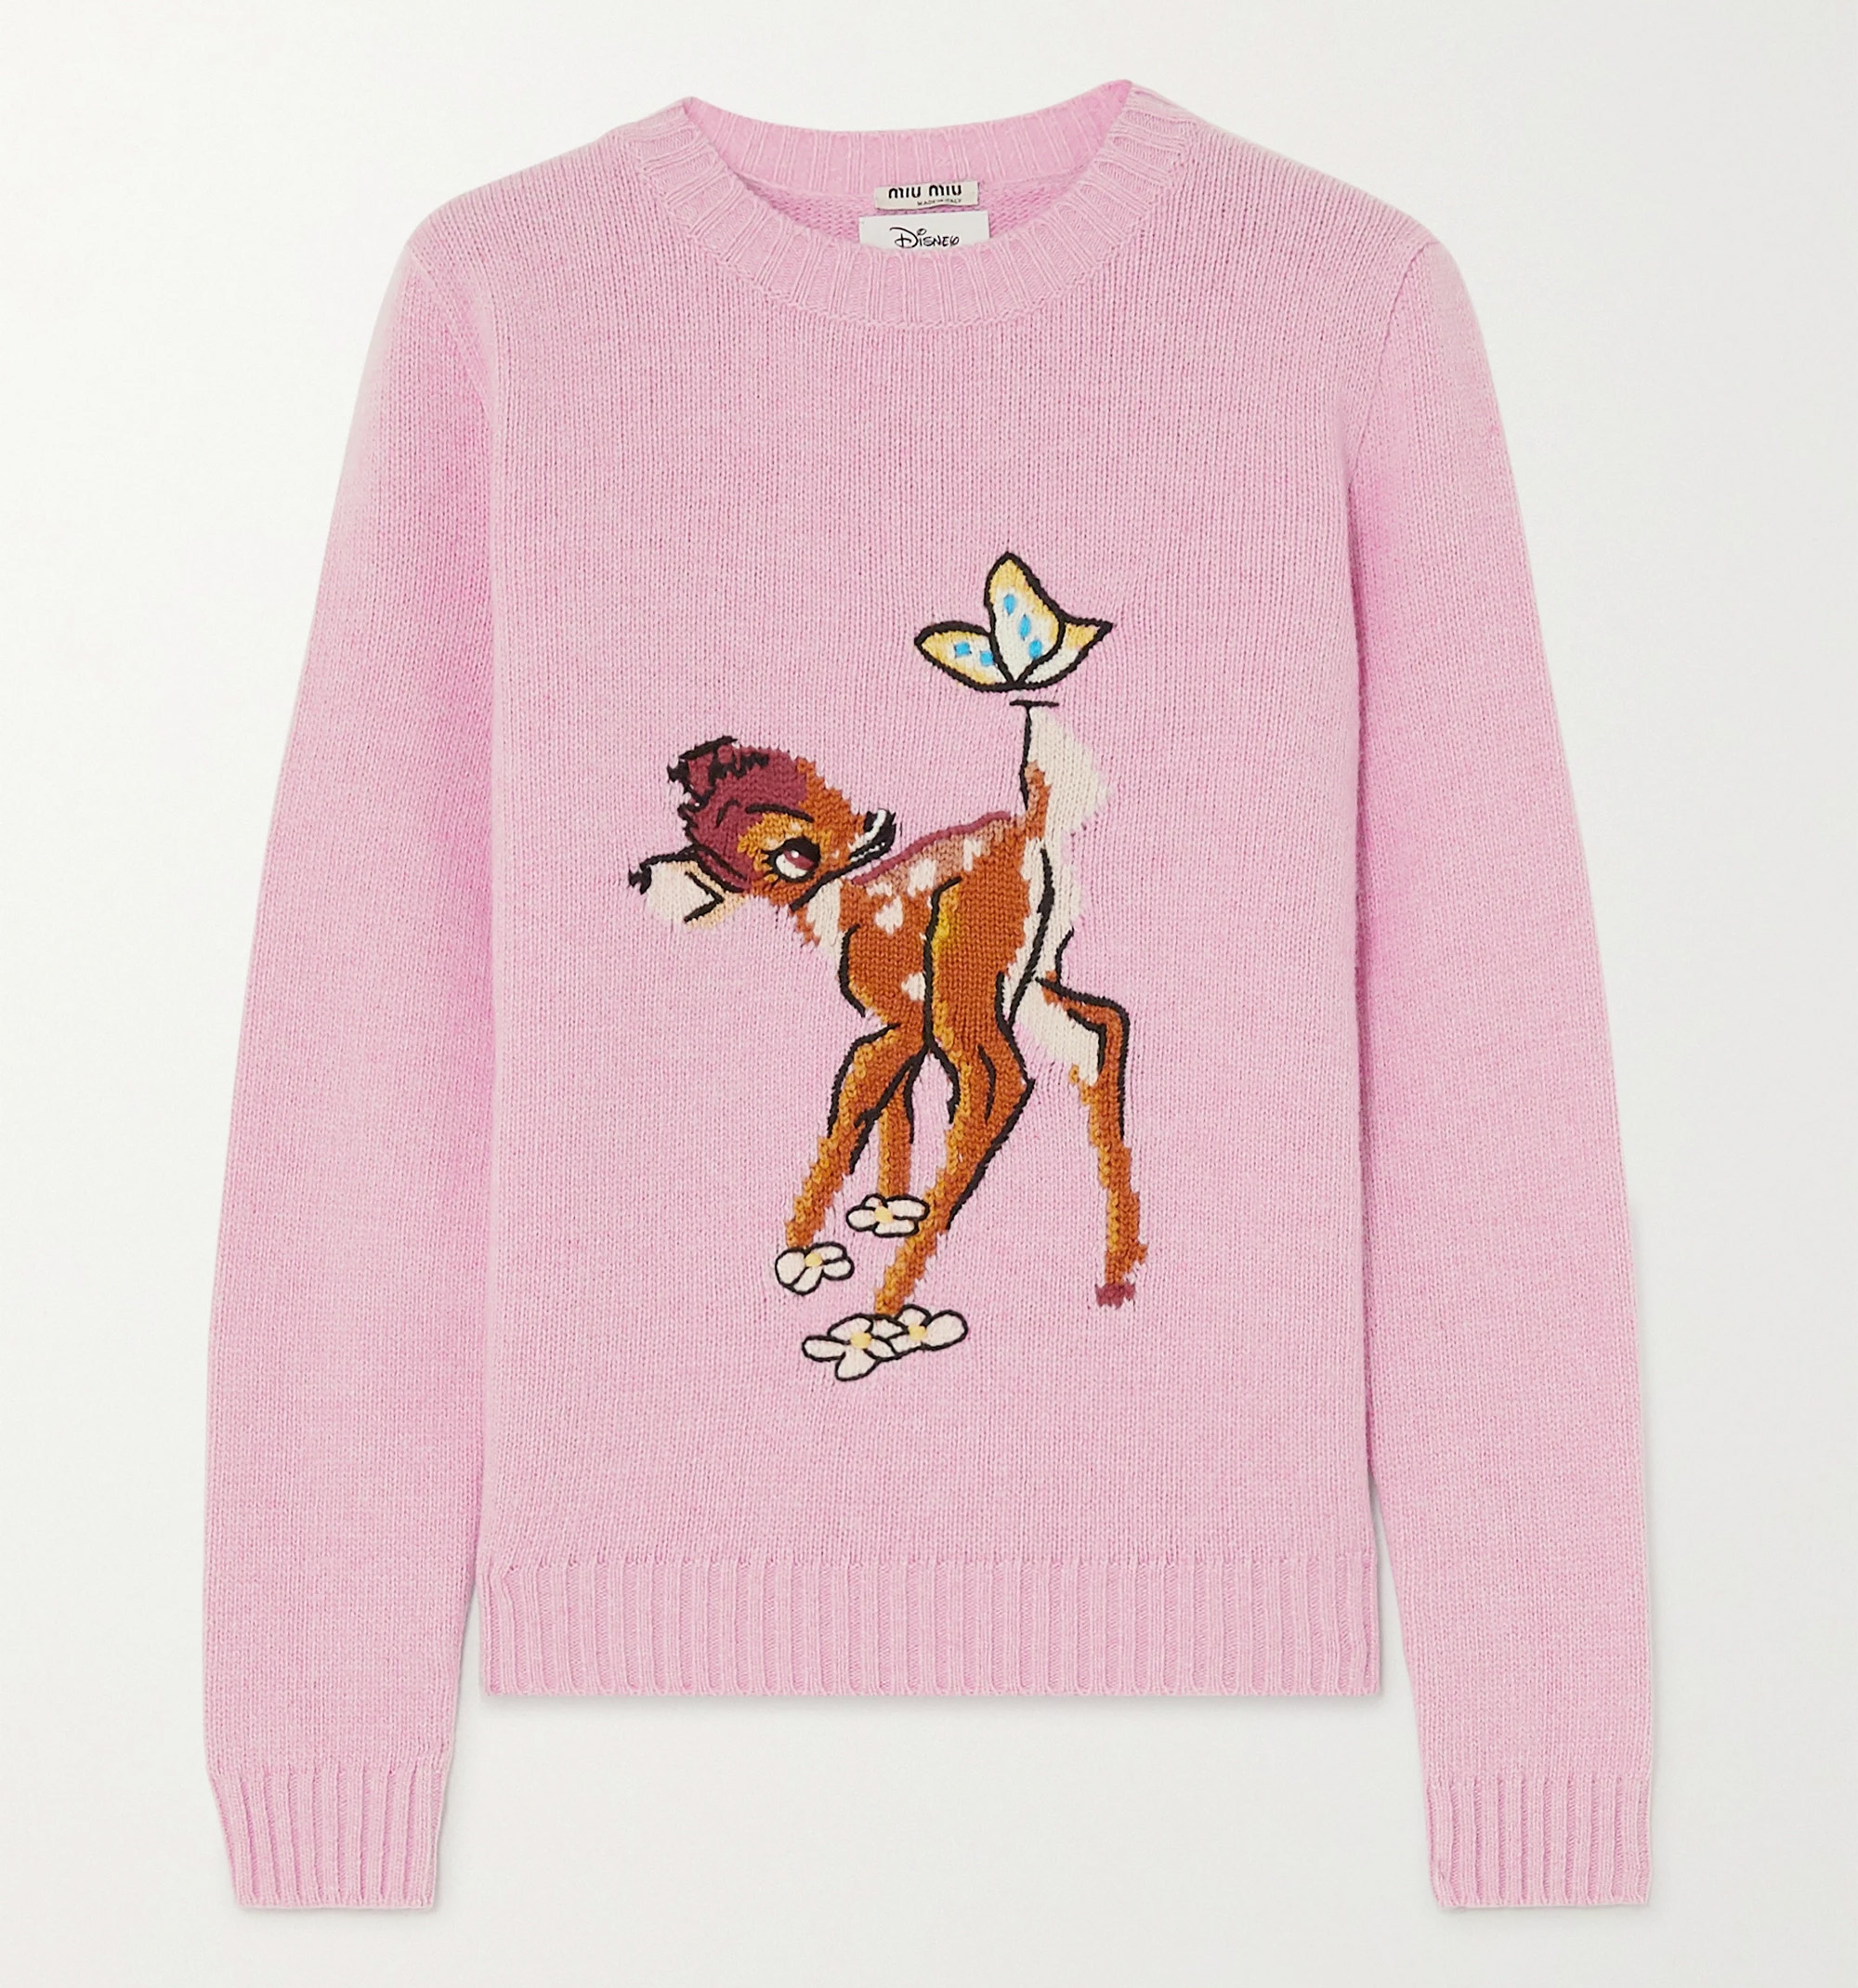 miu-miu-pulover